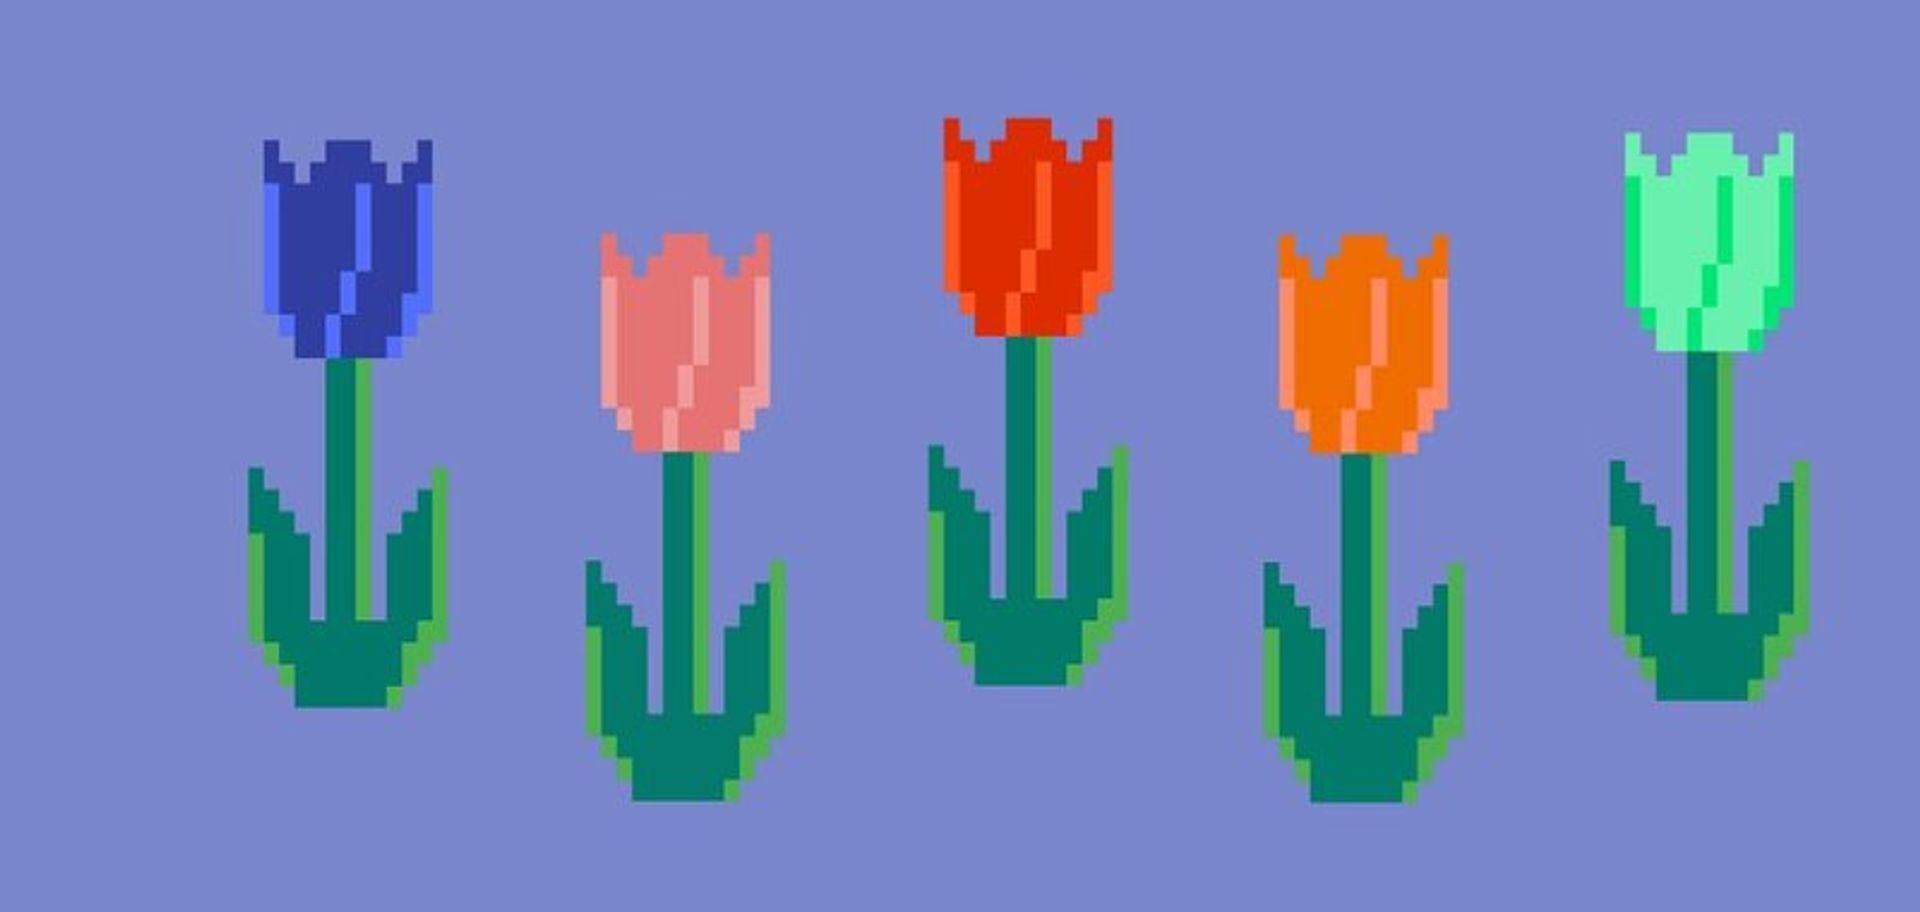 NFTS: a tulip mania price bubble? Image: via Crypto Tulips